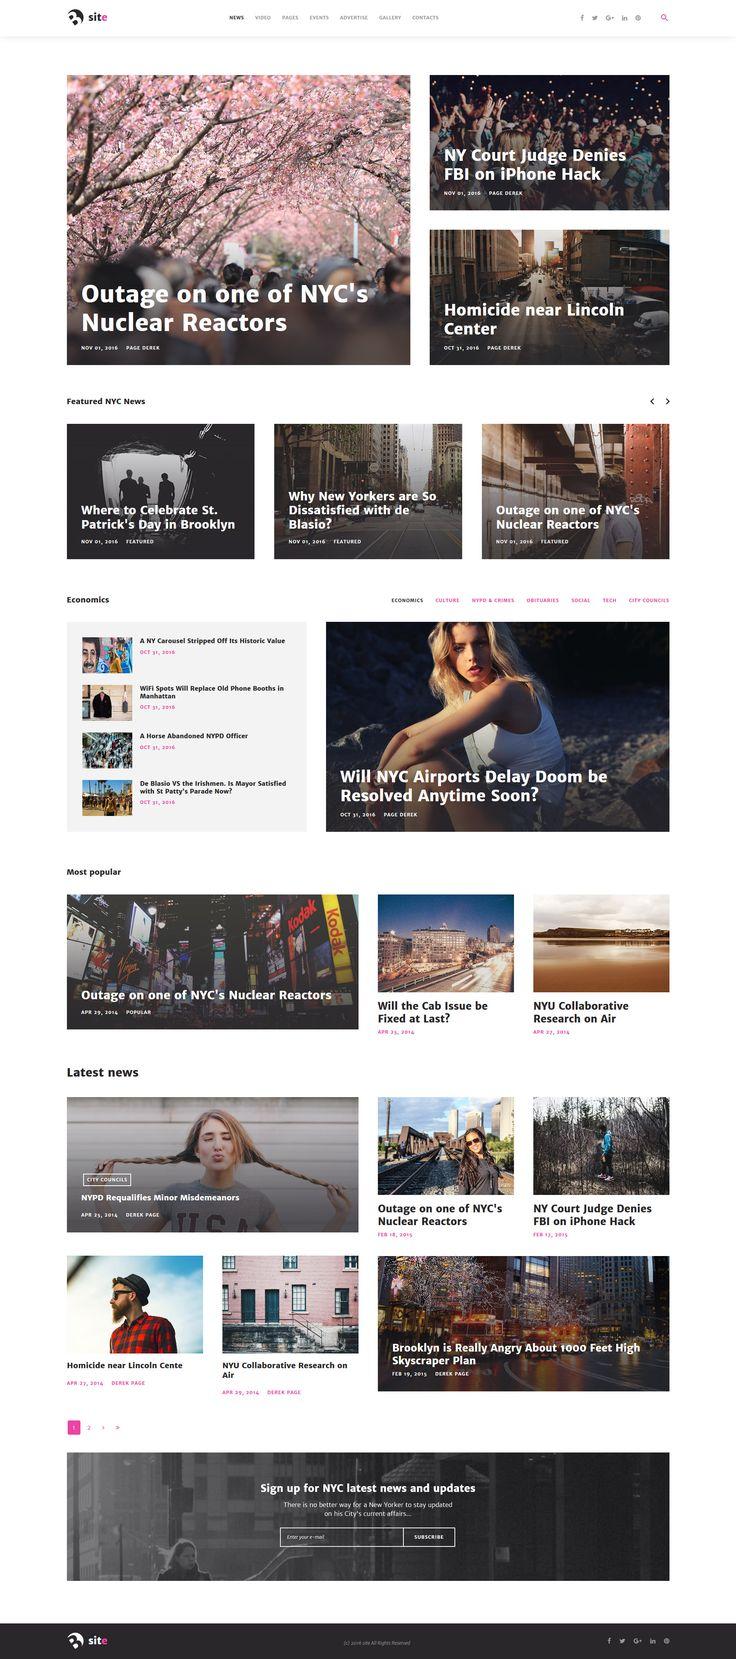 News Portal Responsive Joomla Template - https://www.templatemonster.com/joomla-templates/news-portal-responsive-joomla-template-61405.html